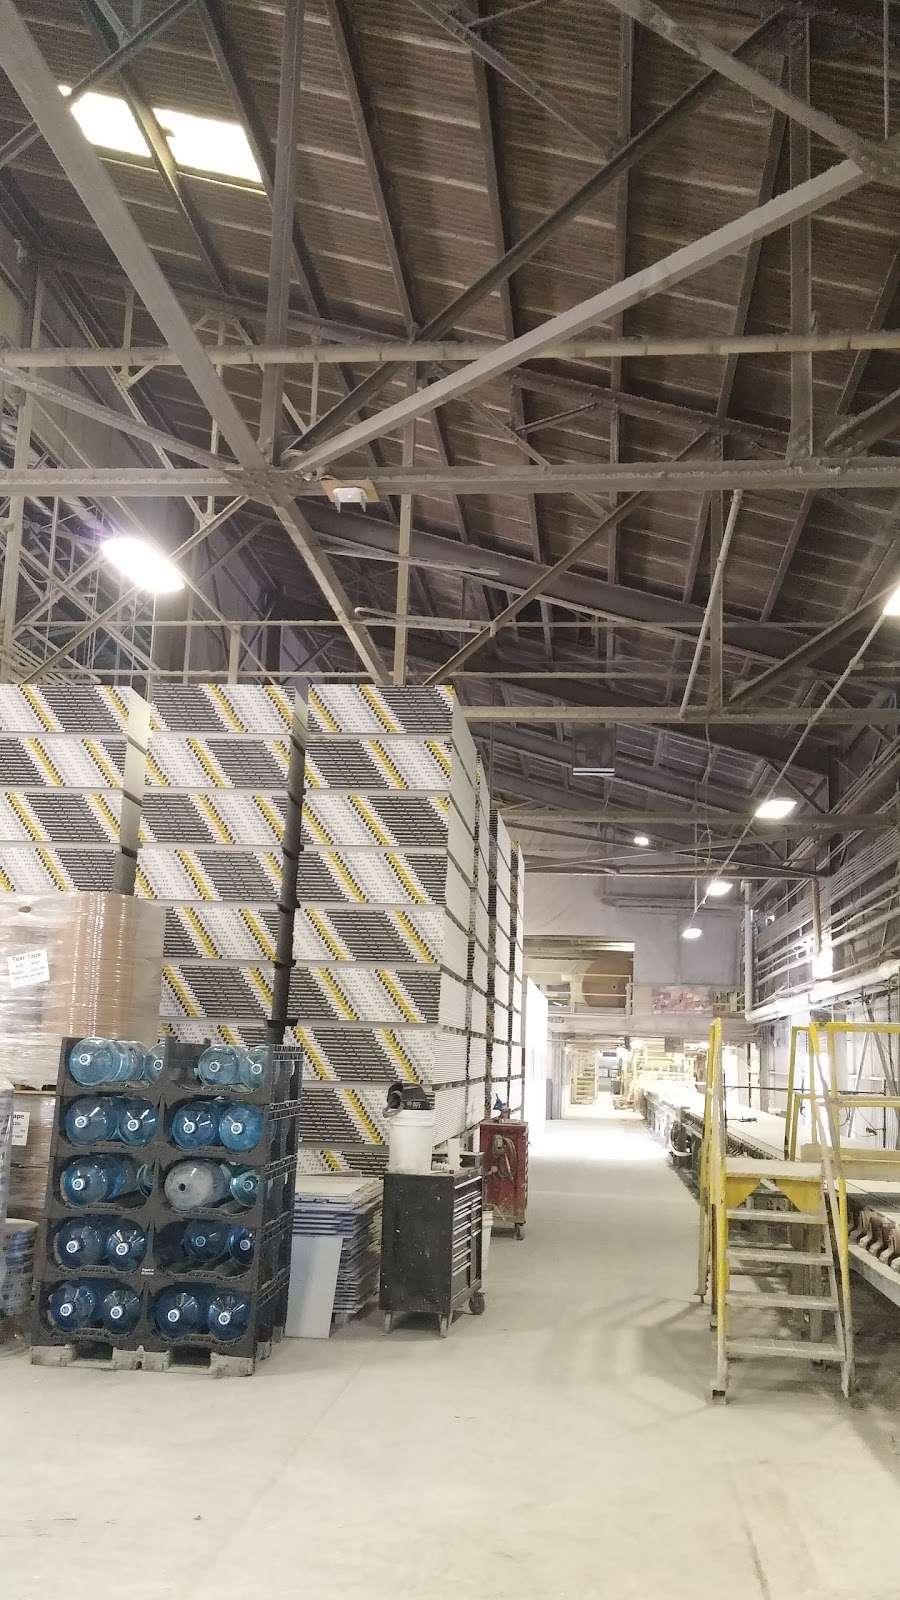 National Gypsum Co - hardware store  | Photo 1 of 5 | Address: 1818 River Rd, Burlington, NJ 08016, USA | Phone: (609) 499-3300